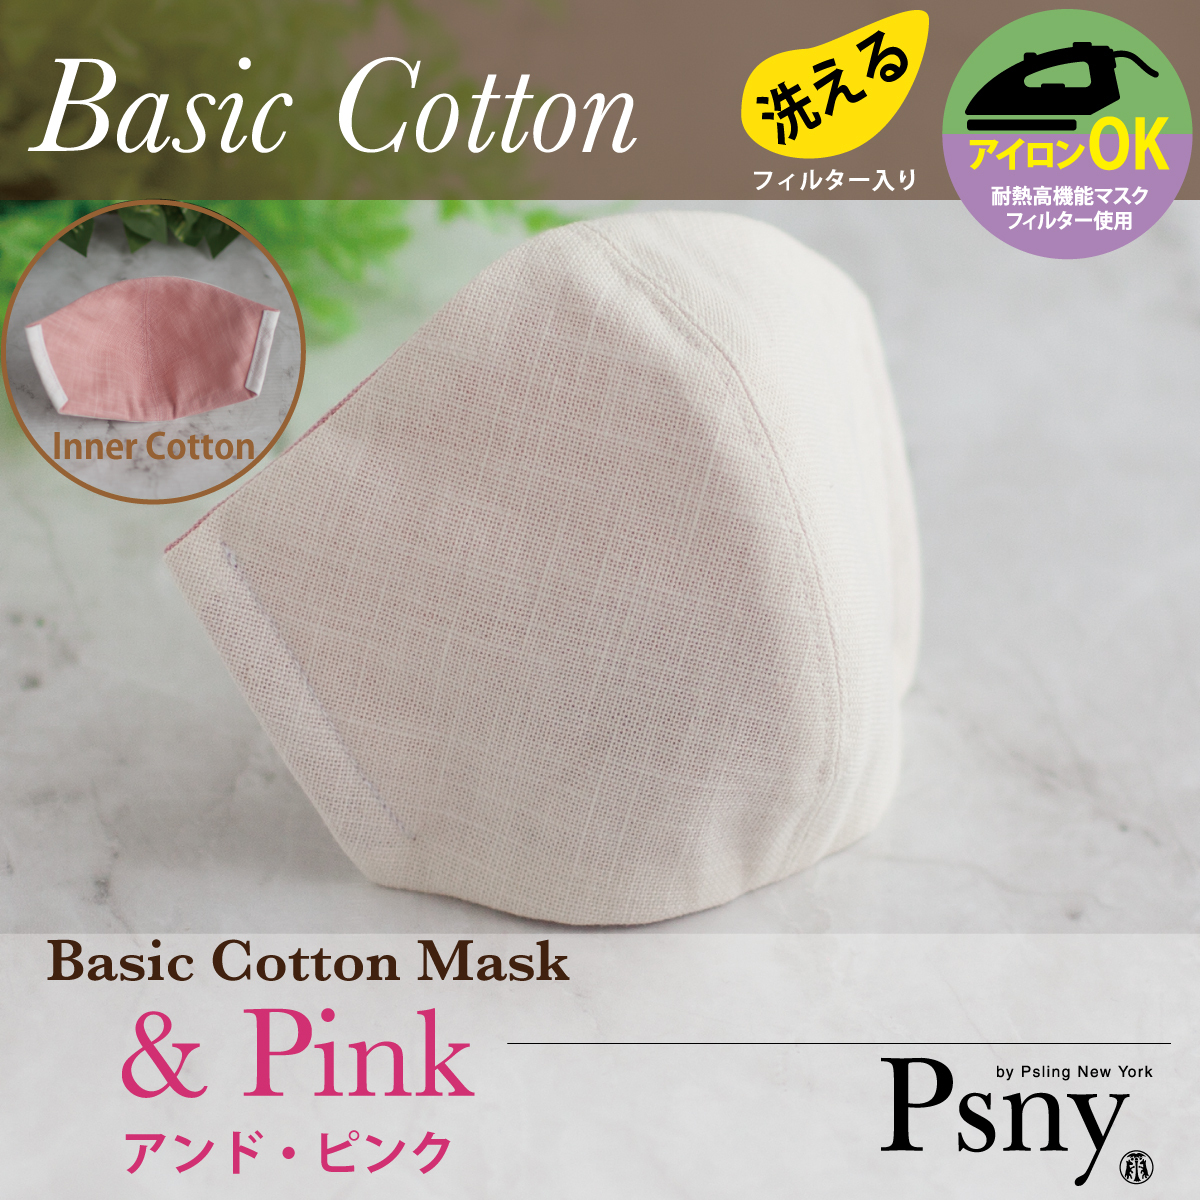 PSNY コットン・オフホワイト(&ピンク) 花粉 黄砂 洗えるフィルター入り 立体 マスク 大人用